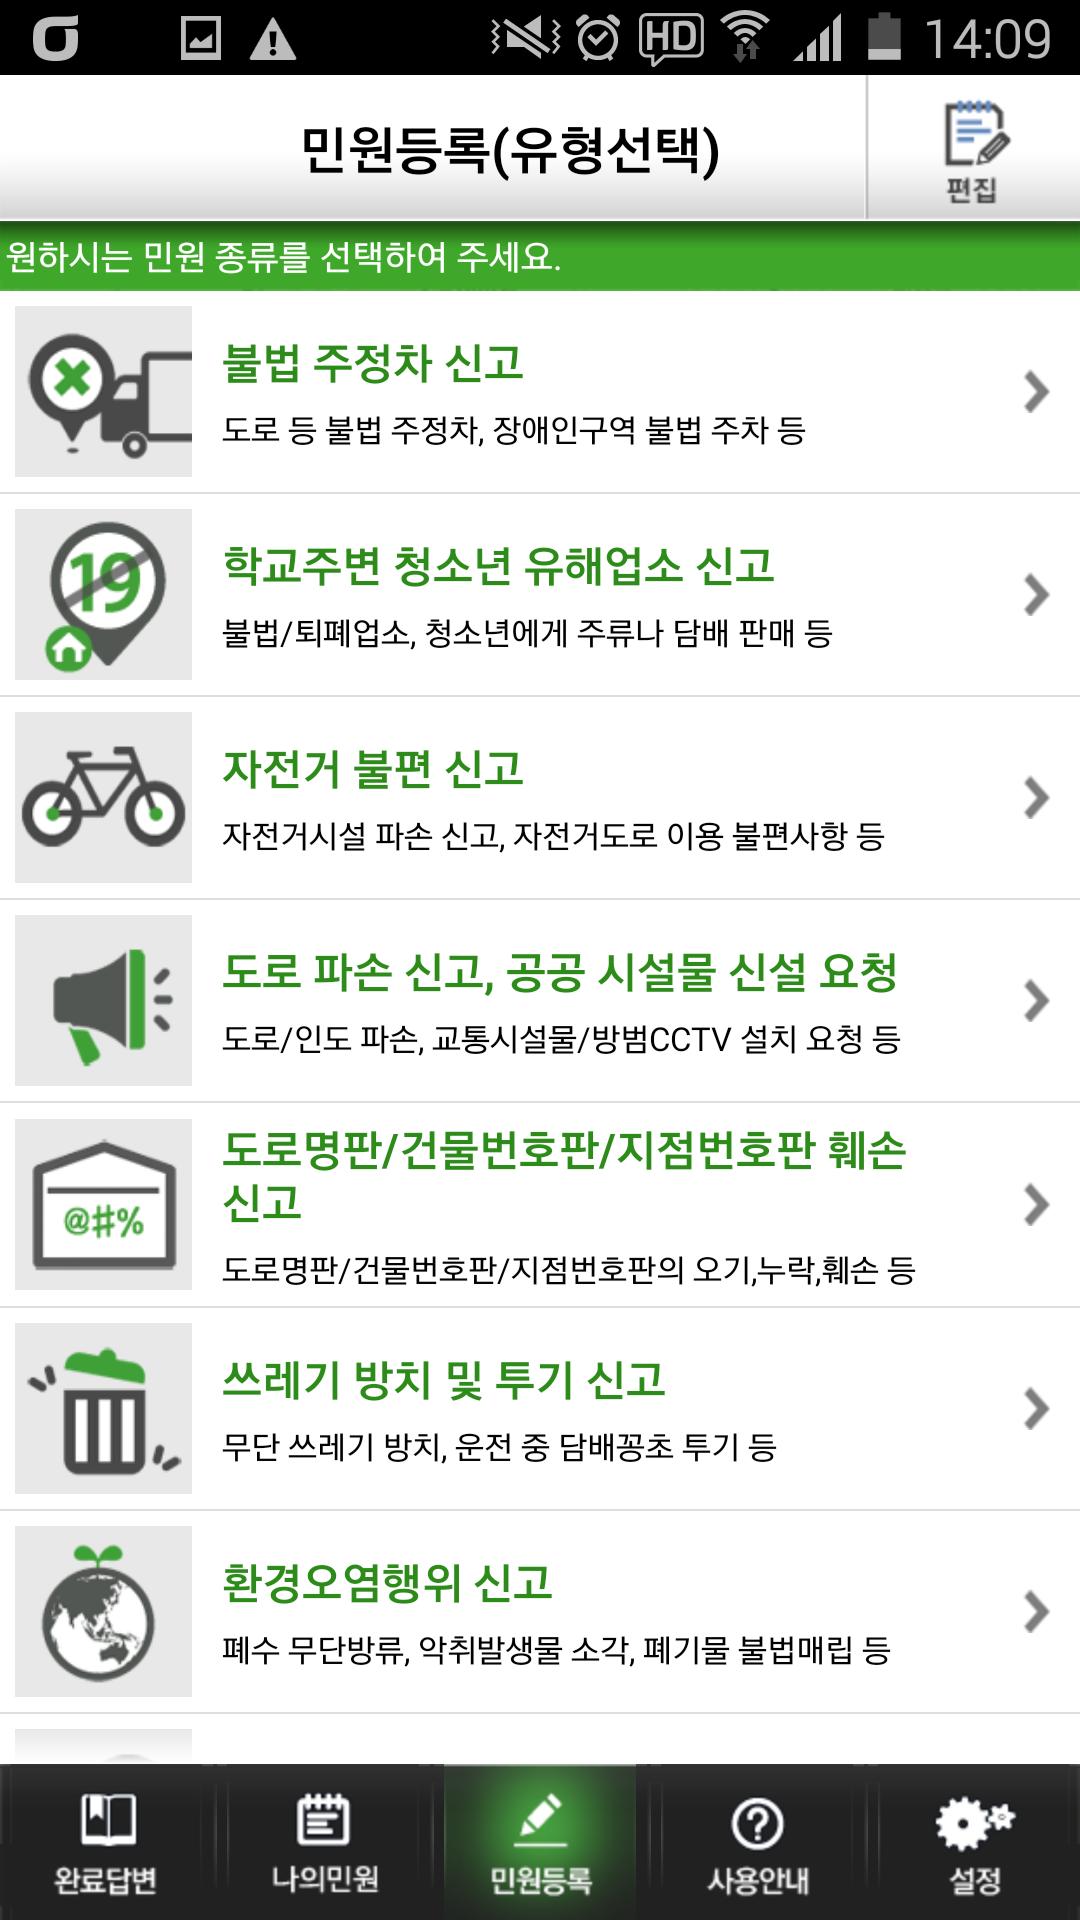 Korea Inconveniences App